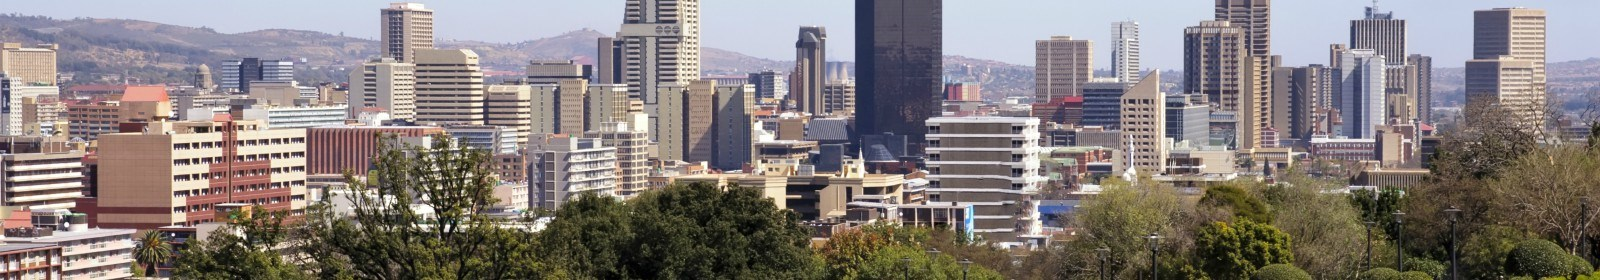 Estate living in Centurion and Pretoria East